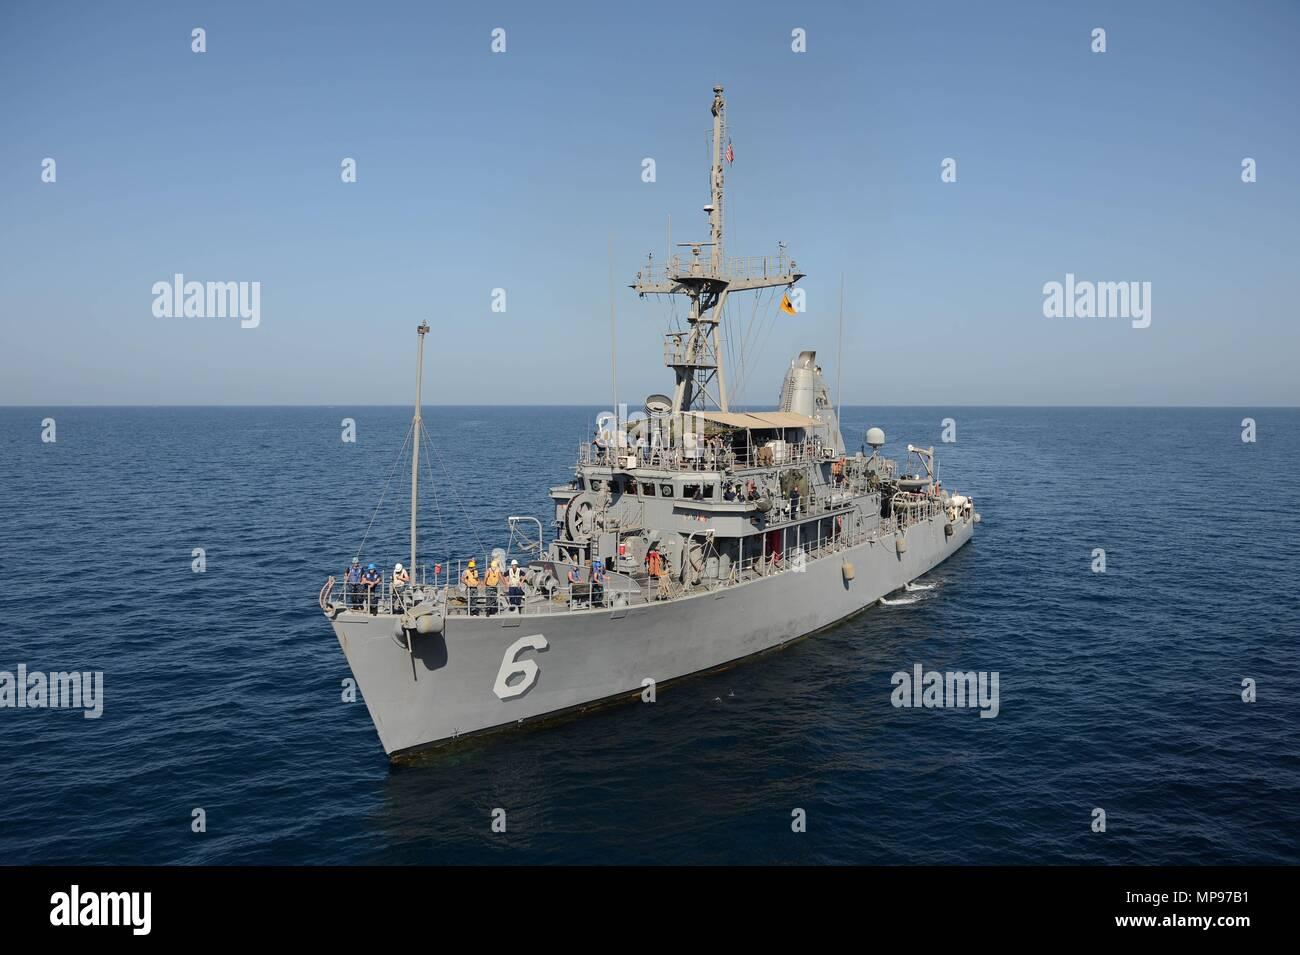 The U.S. Navy Avenger-class mine countermeasures ship USS Devastator steams underway November 6, 2014 in the Gulf of Oman.   (photo by Ace Rheaume via Planetpix) Stock Photo